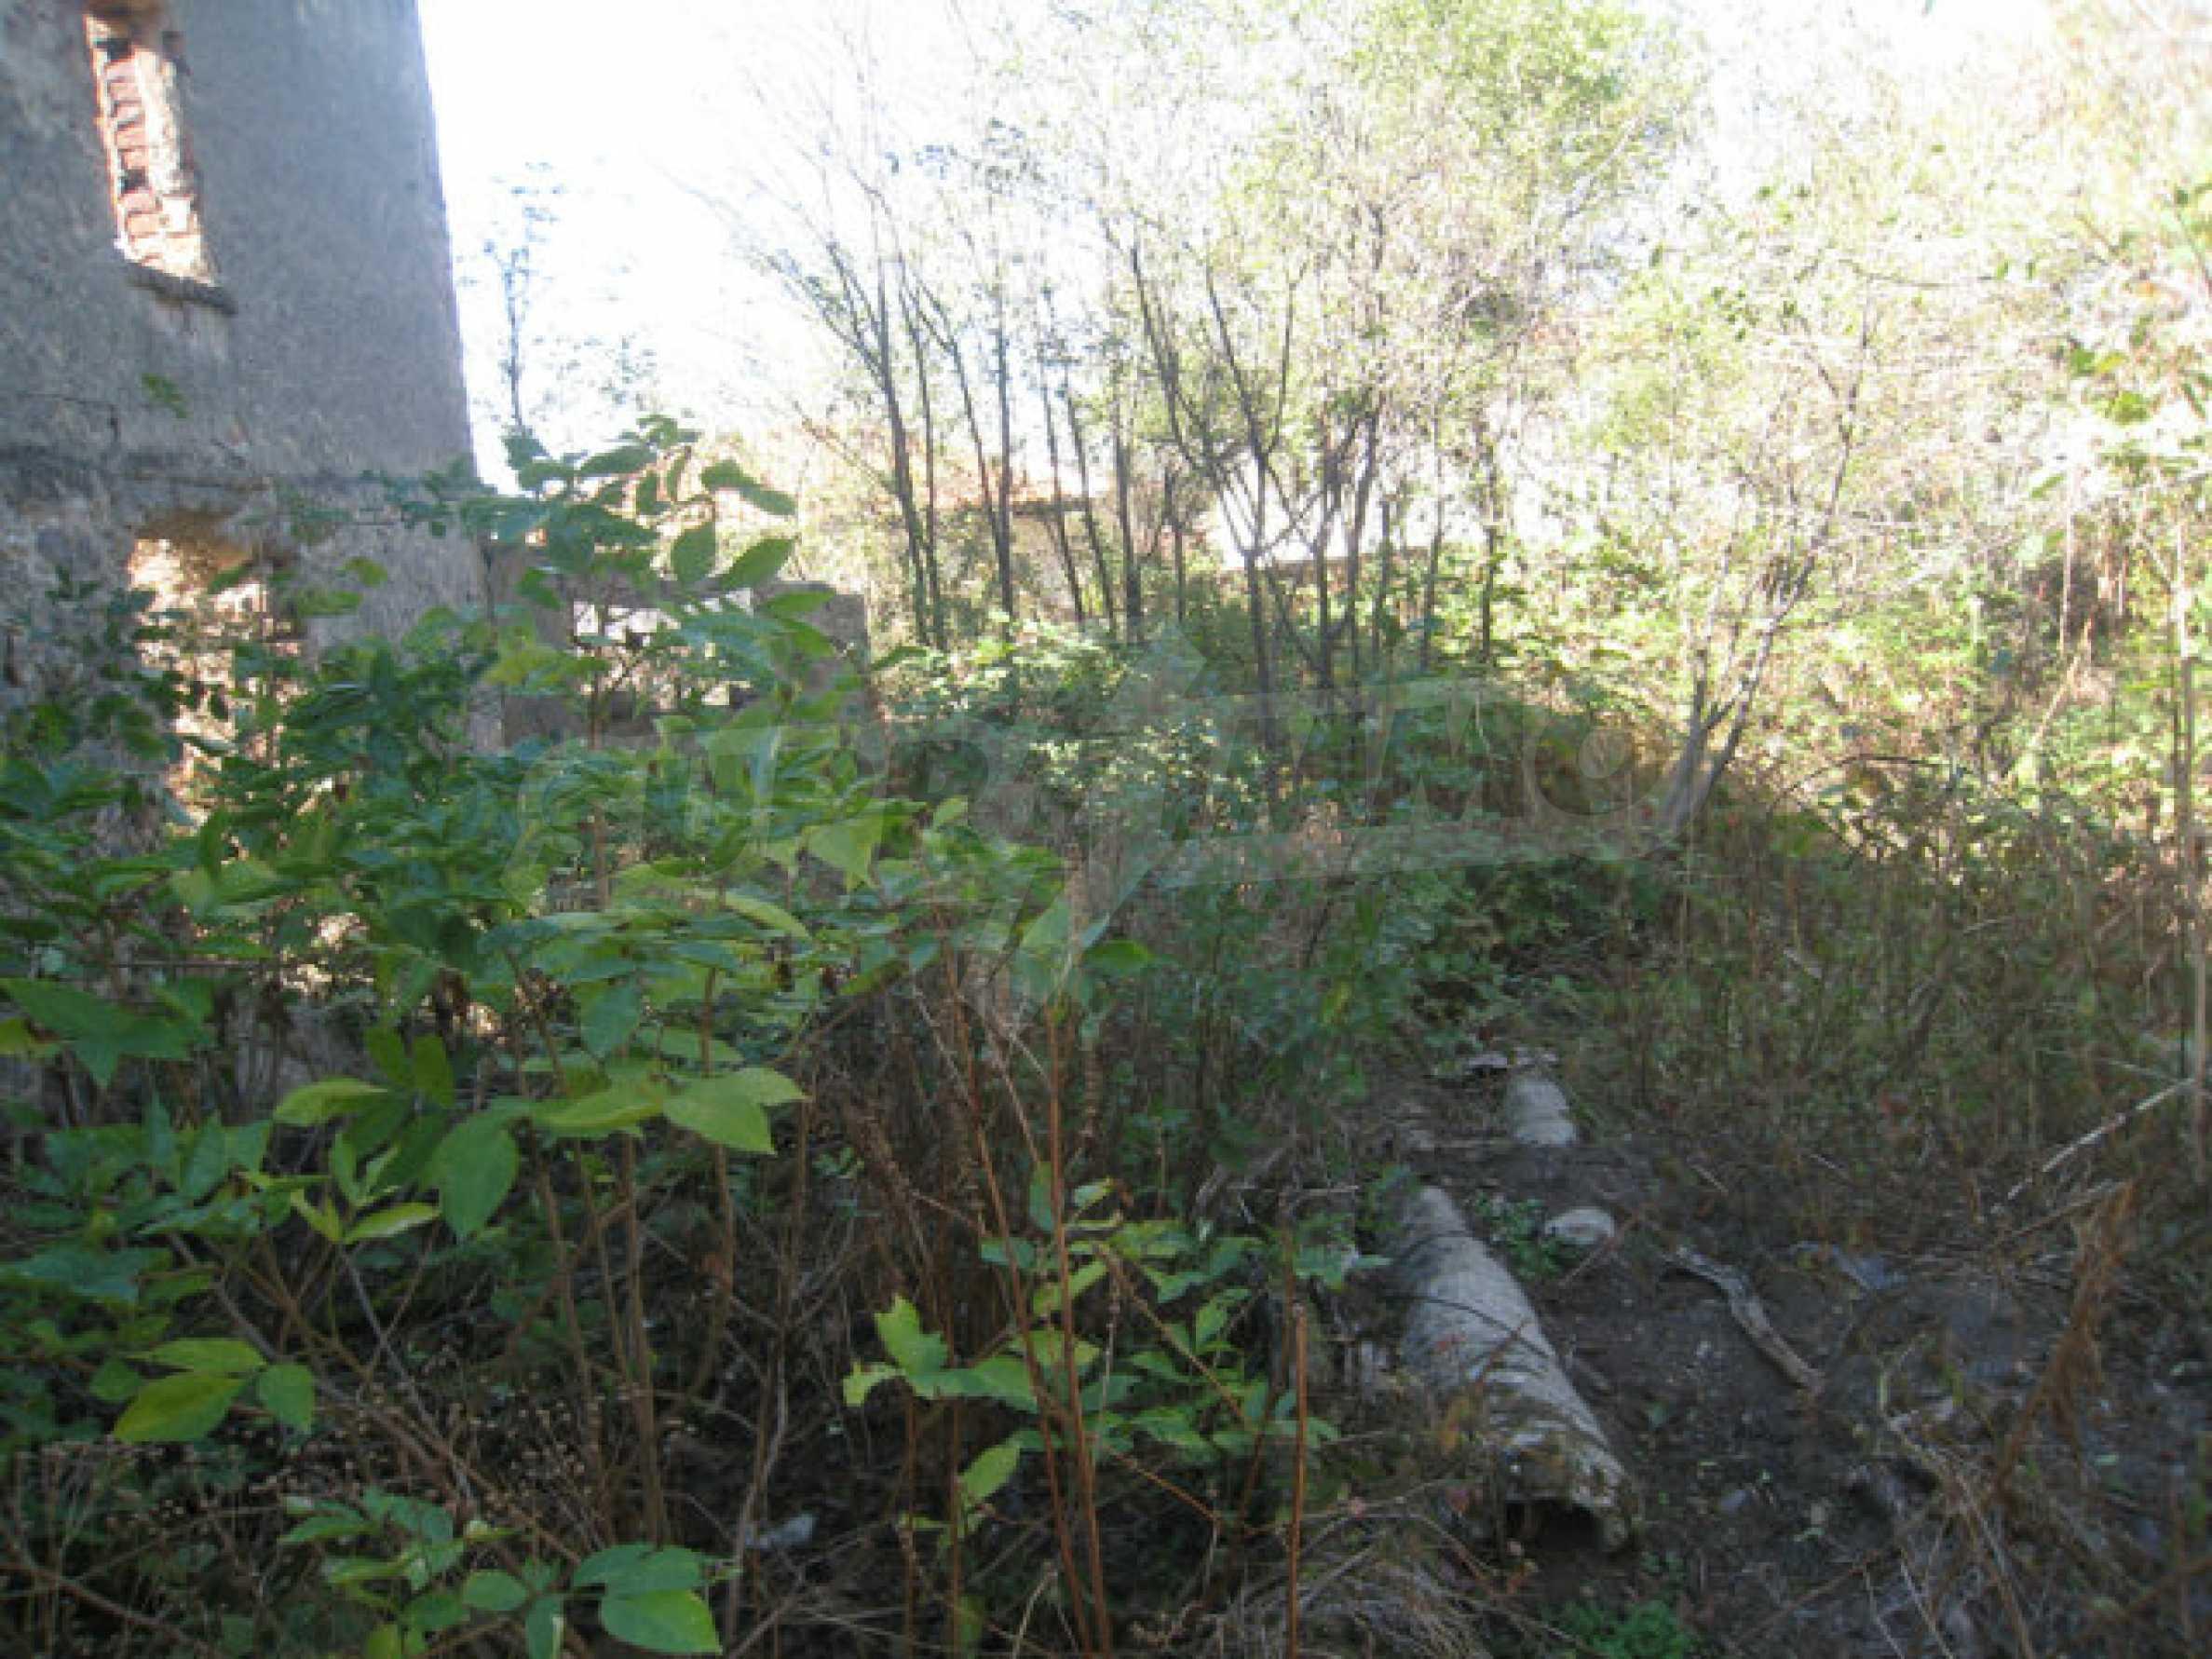 Bargain regulated plot in Ihtiman municipality near the highway and Sofia 10